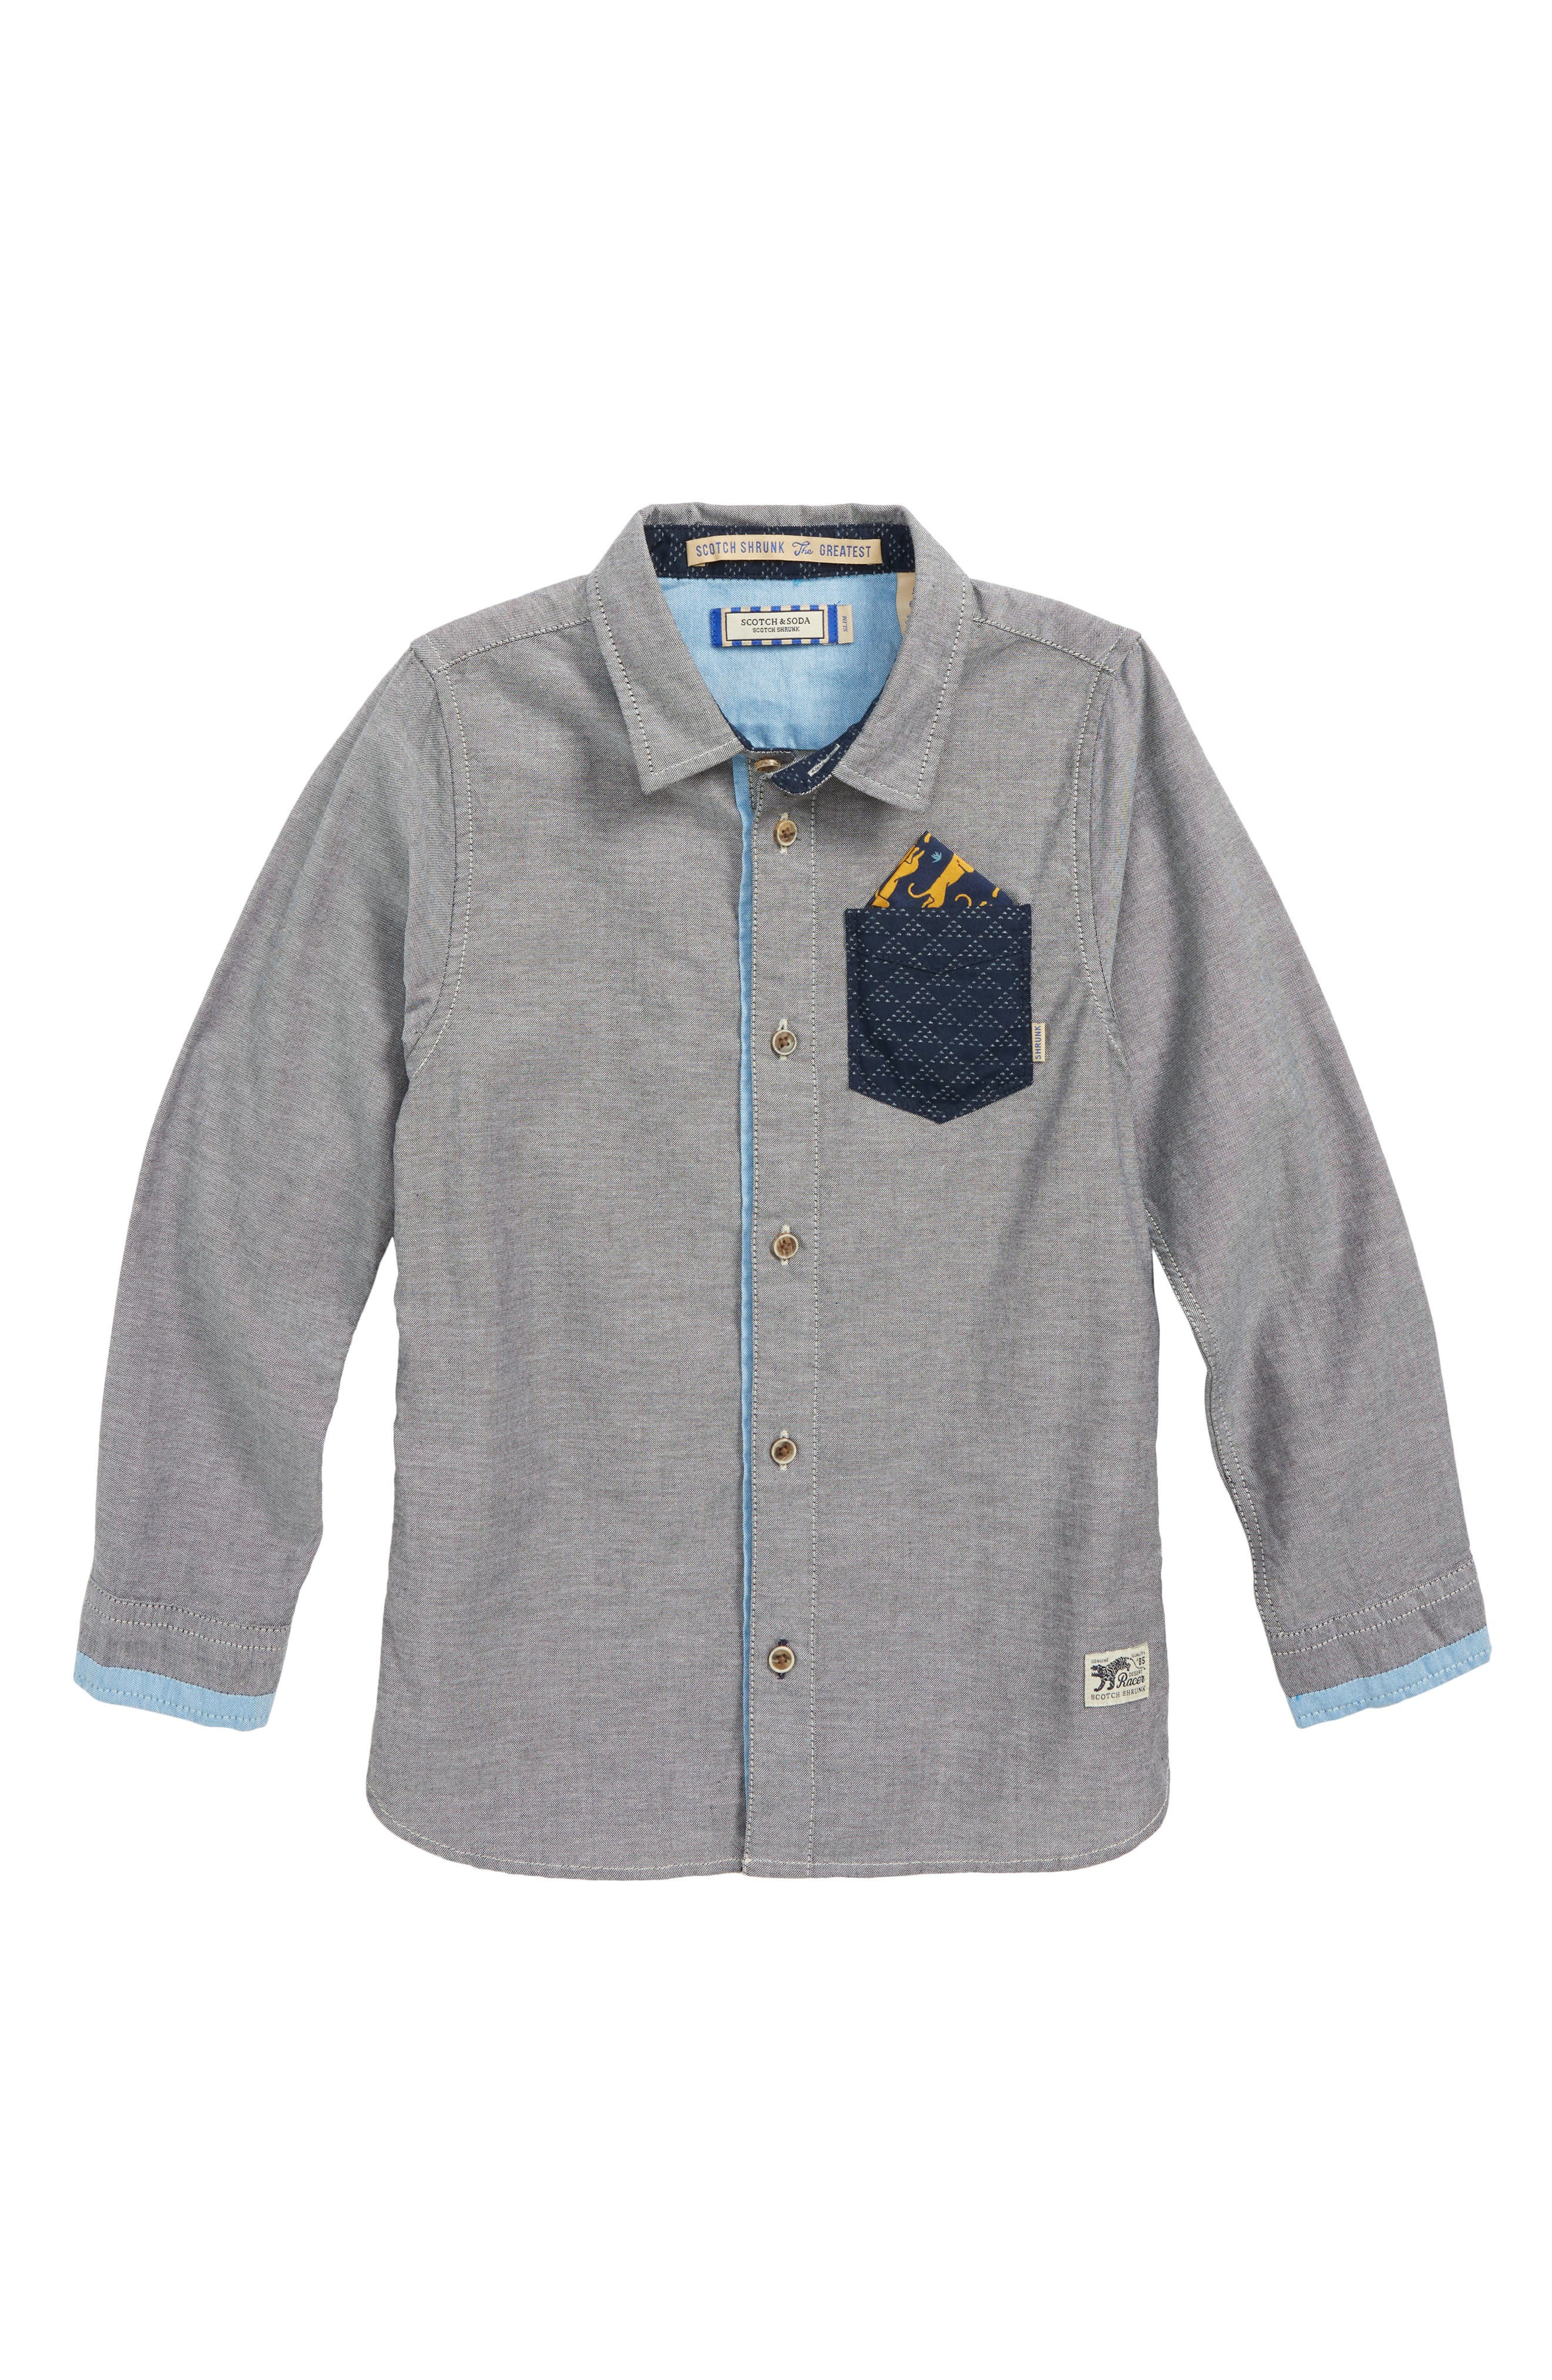 Contrast Pocket Shirt,                             Main thumbnail 1, color,                             605 Z